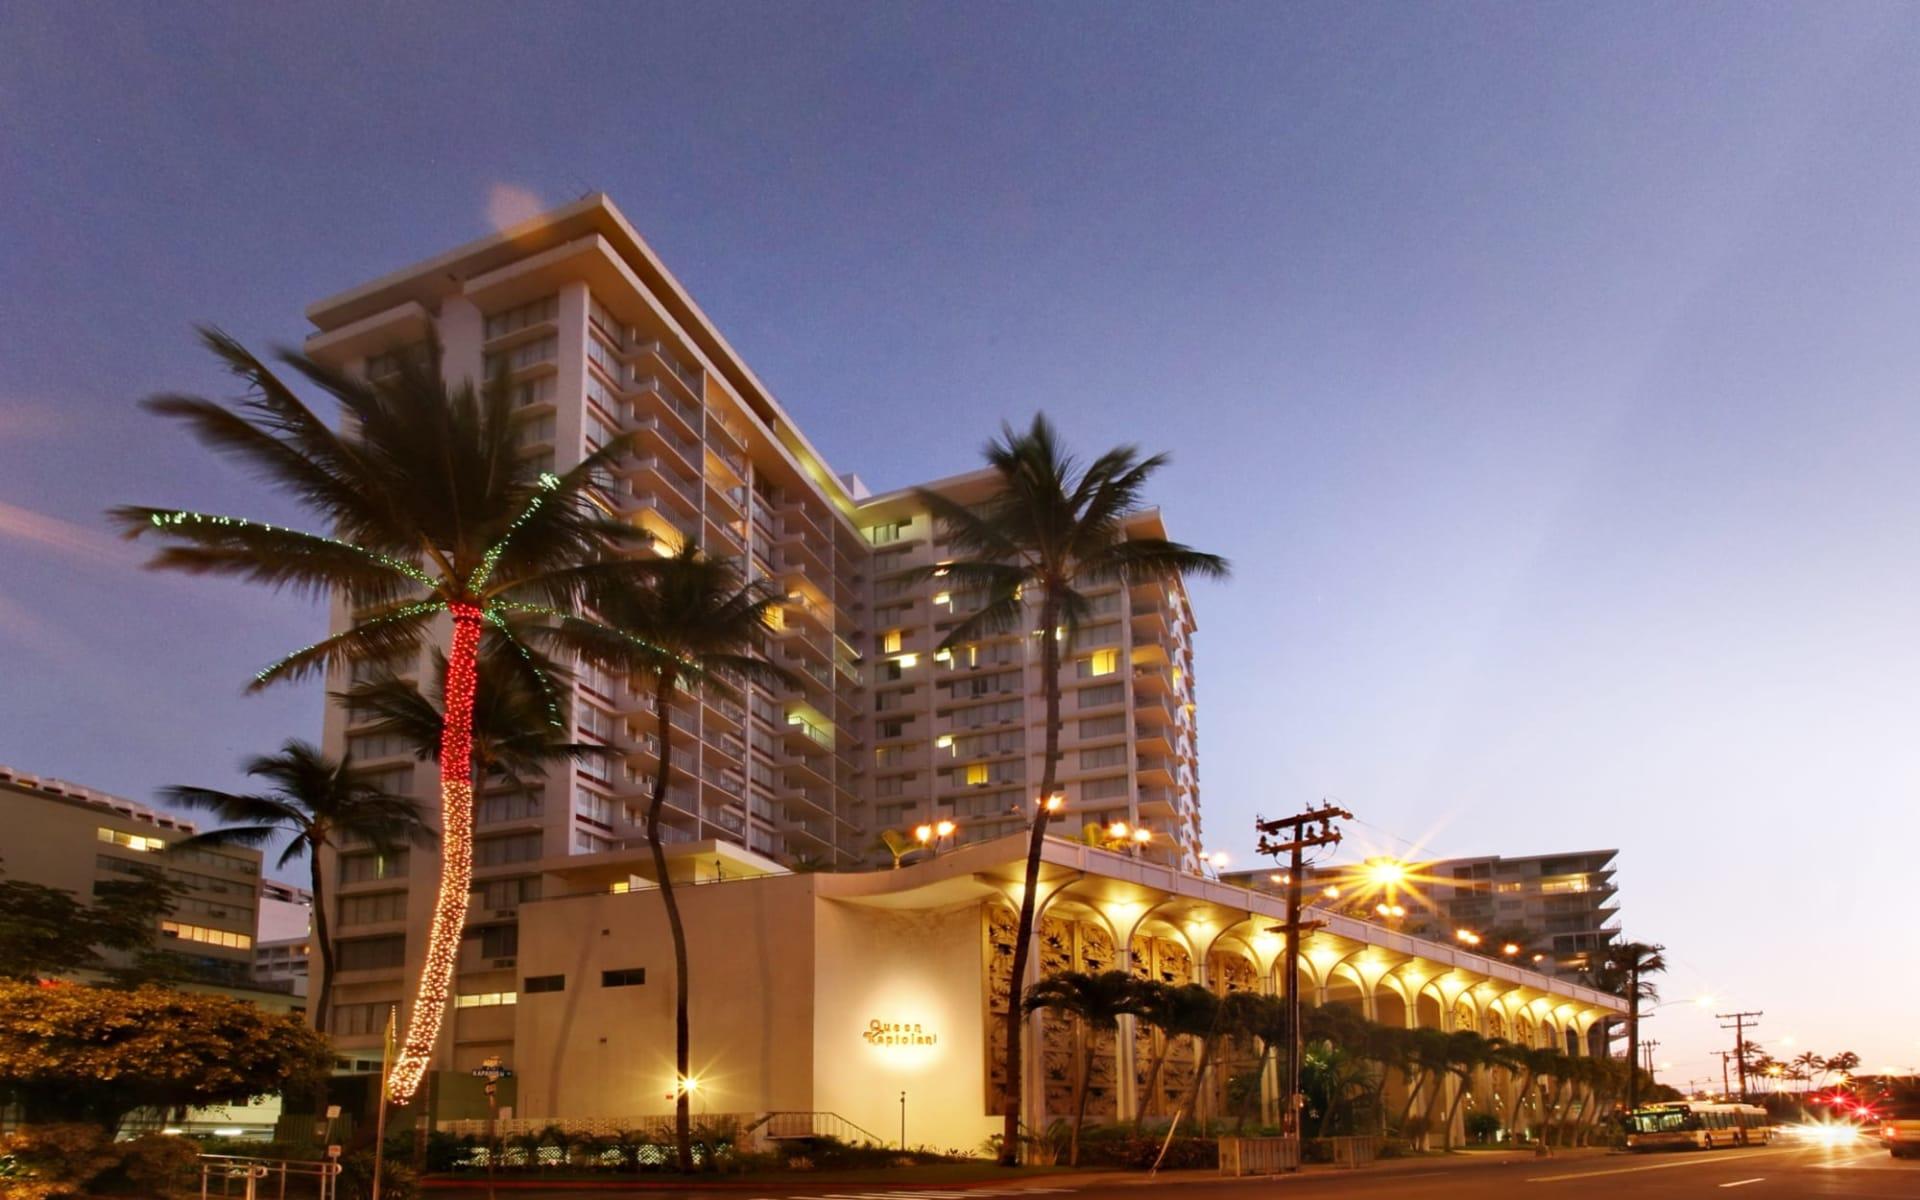 Queen Kapiolani Hotel in Honolulu - Oahu:  Queen Kapiolani Hotel_Aussenansicht